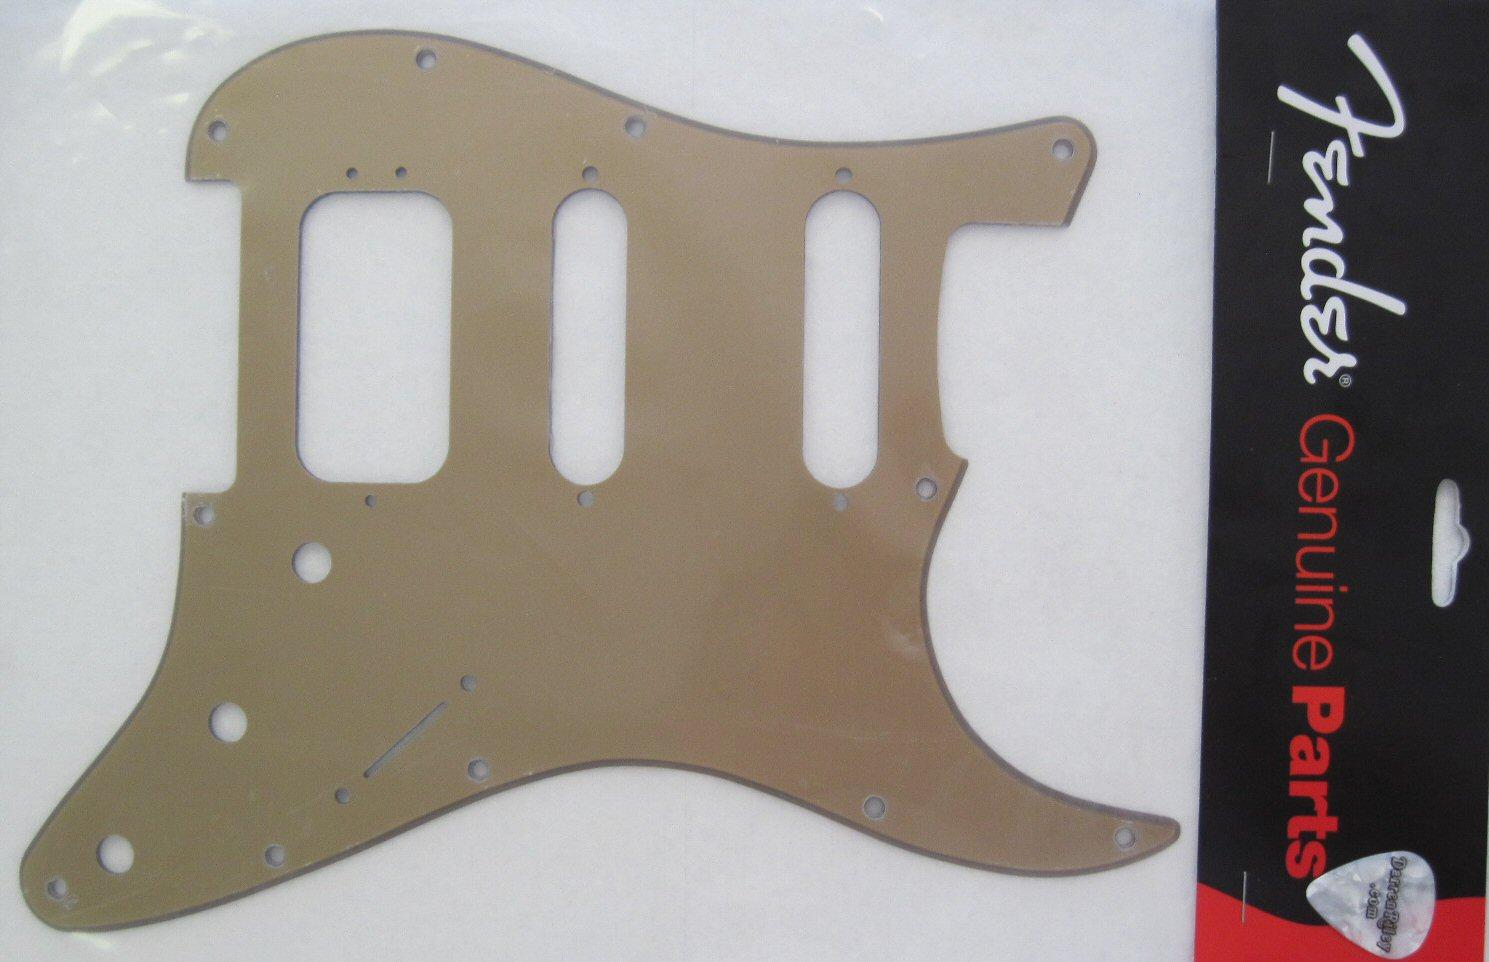 Fender American Deluxe Stratocaster Pickguard Gold 0064010000